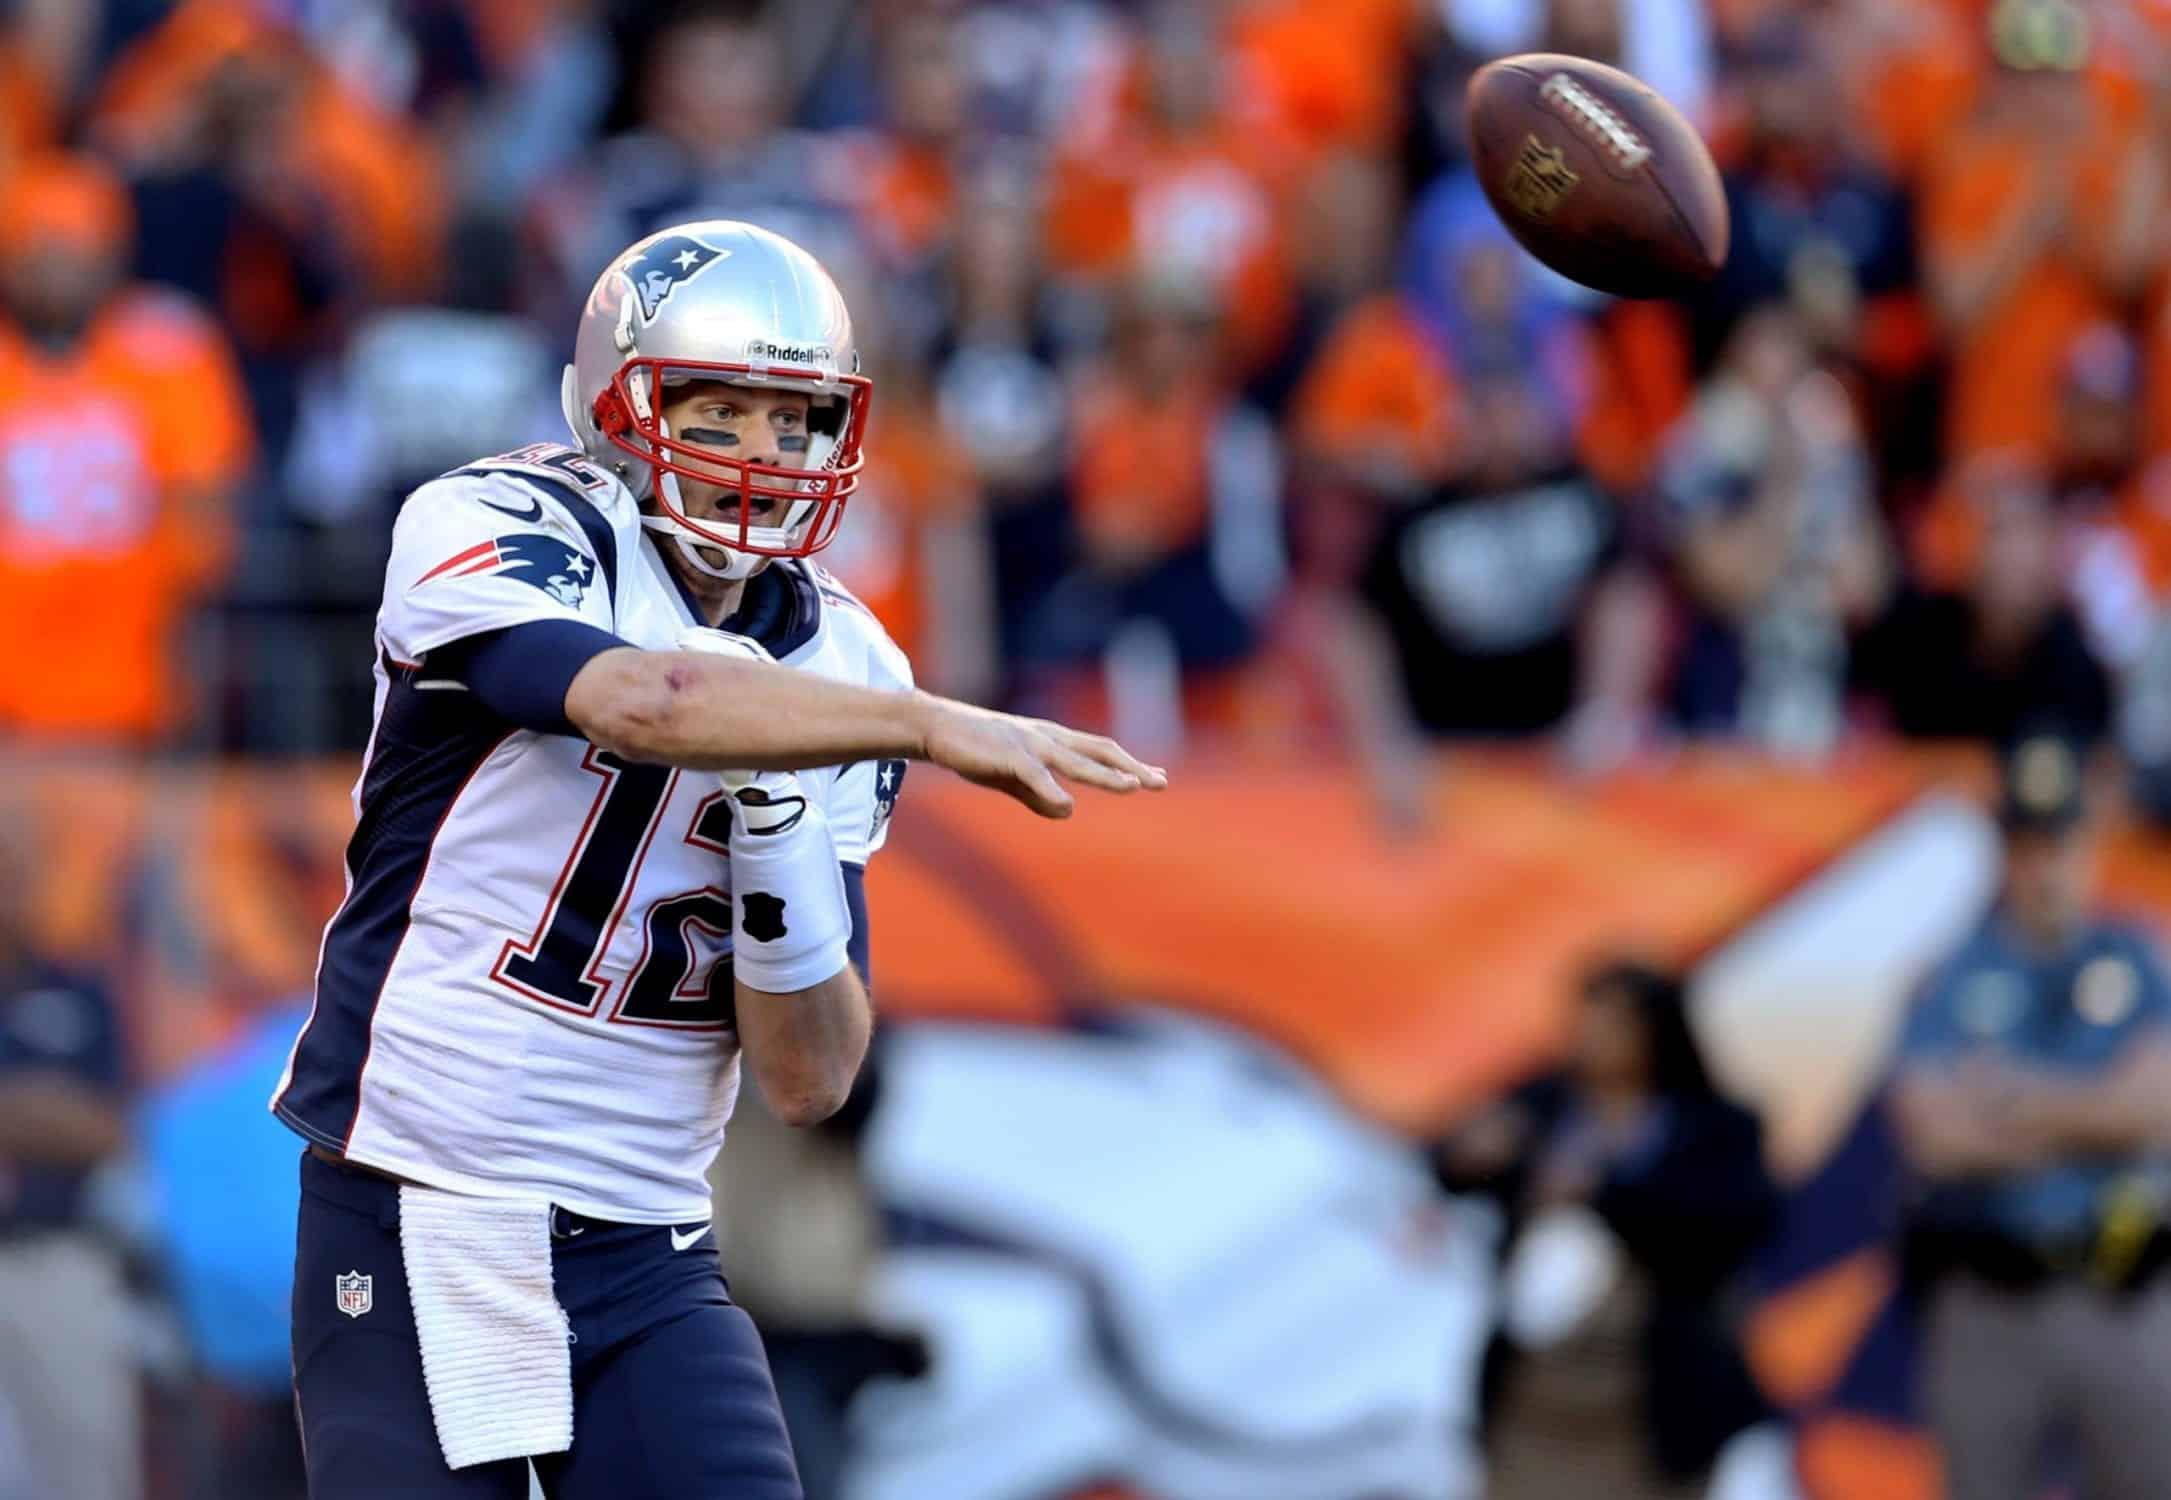 Where will New England Patriots QB Tom Brady play in 2020?